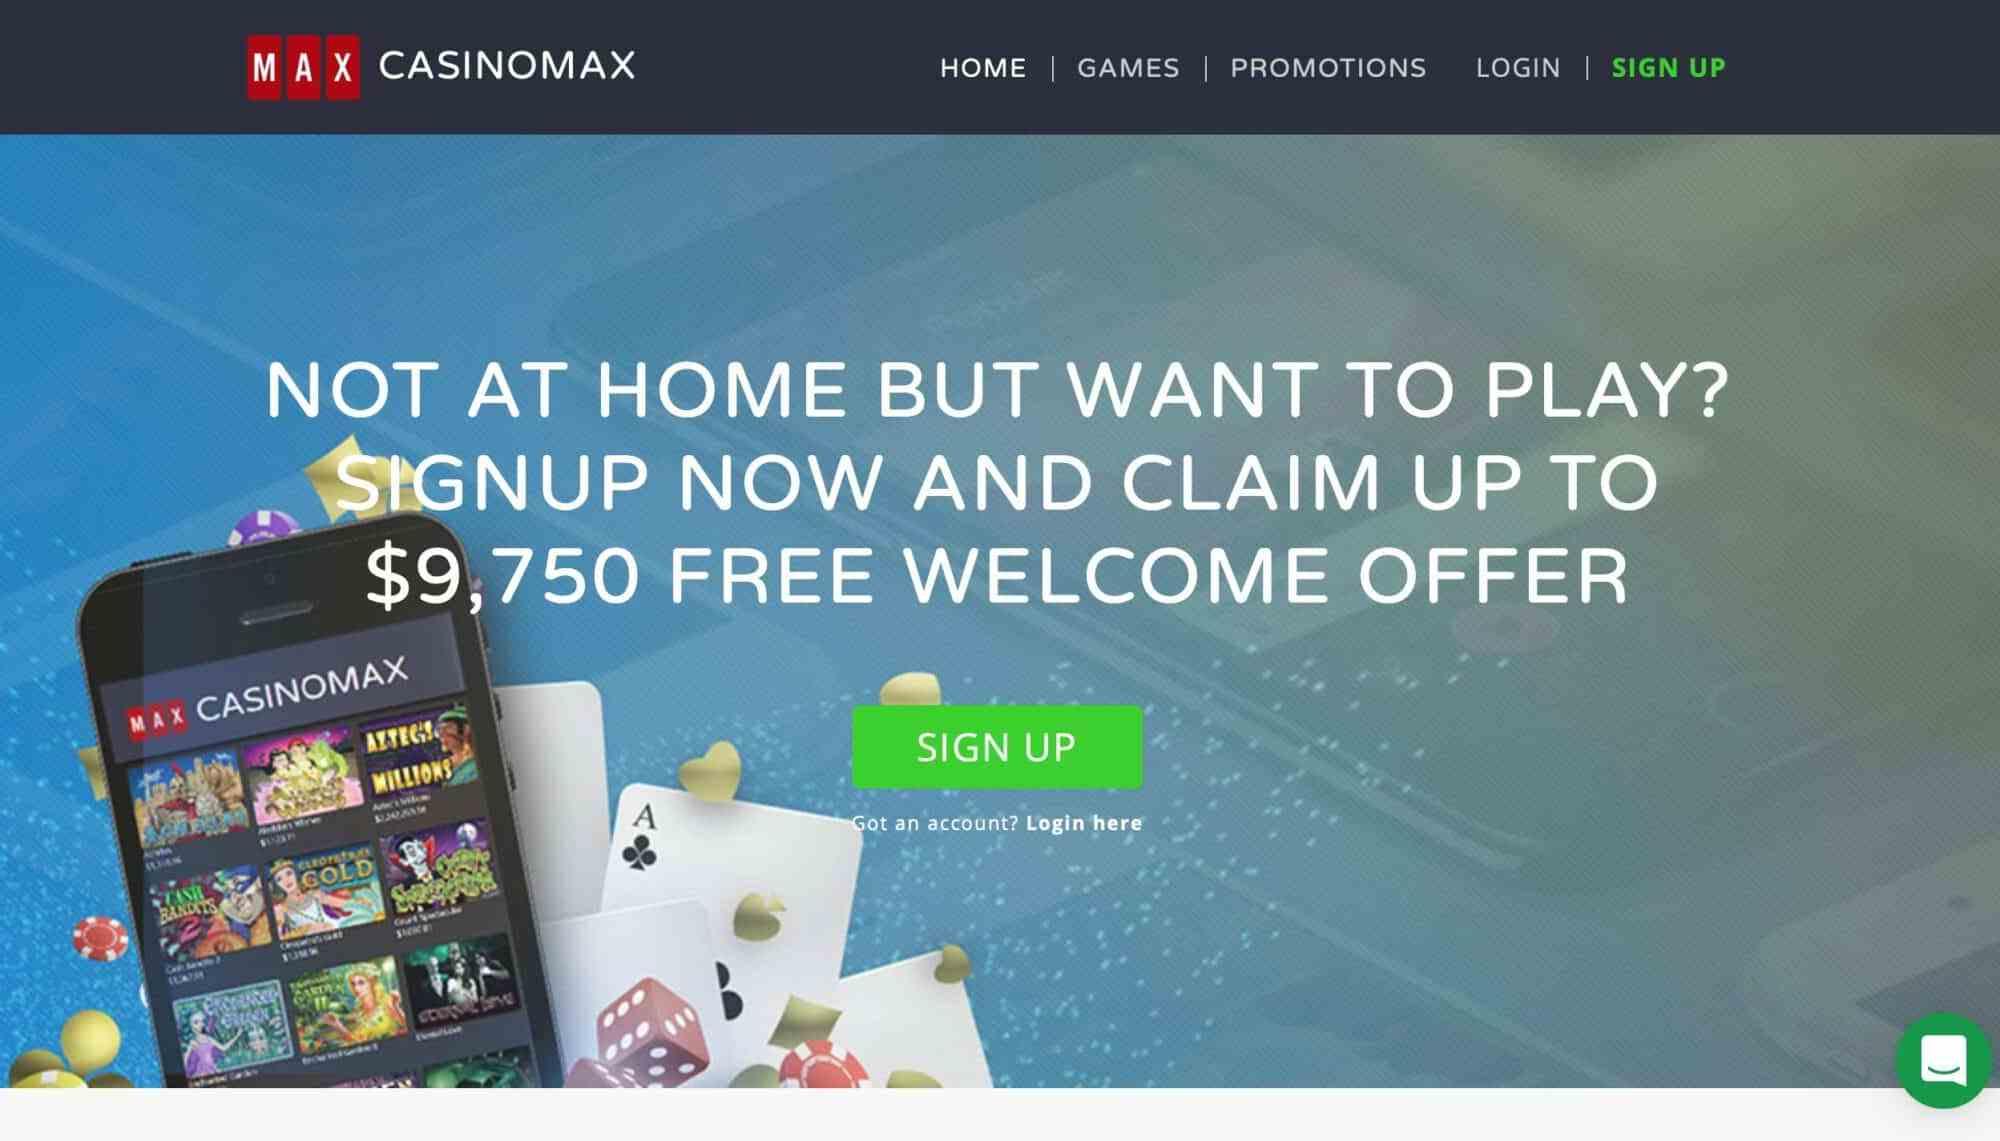 Casino Max - Get 325% Deposit Bonus +25 Free Spins For 7 Days